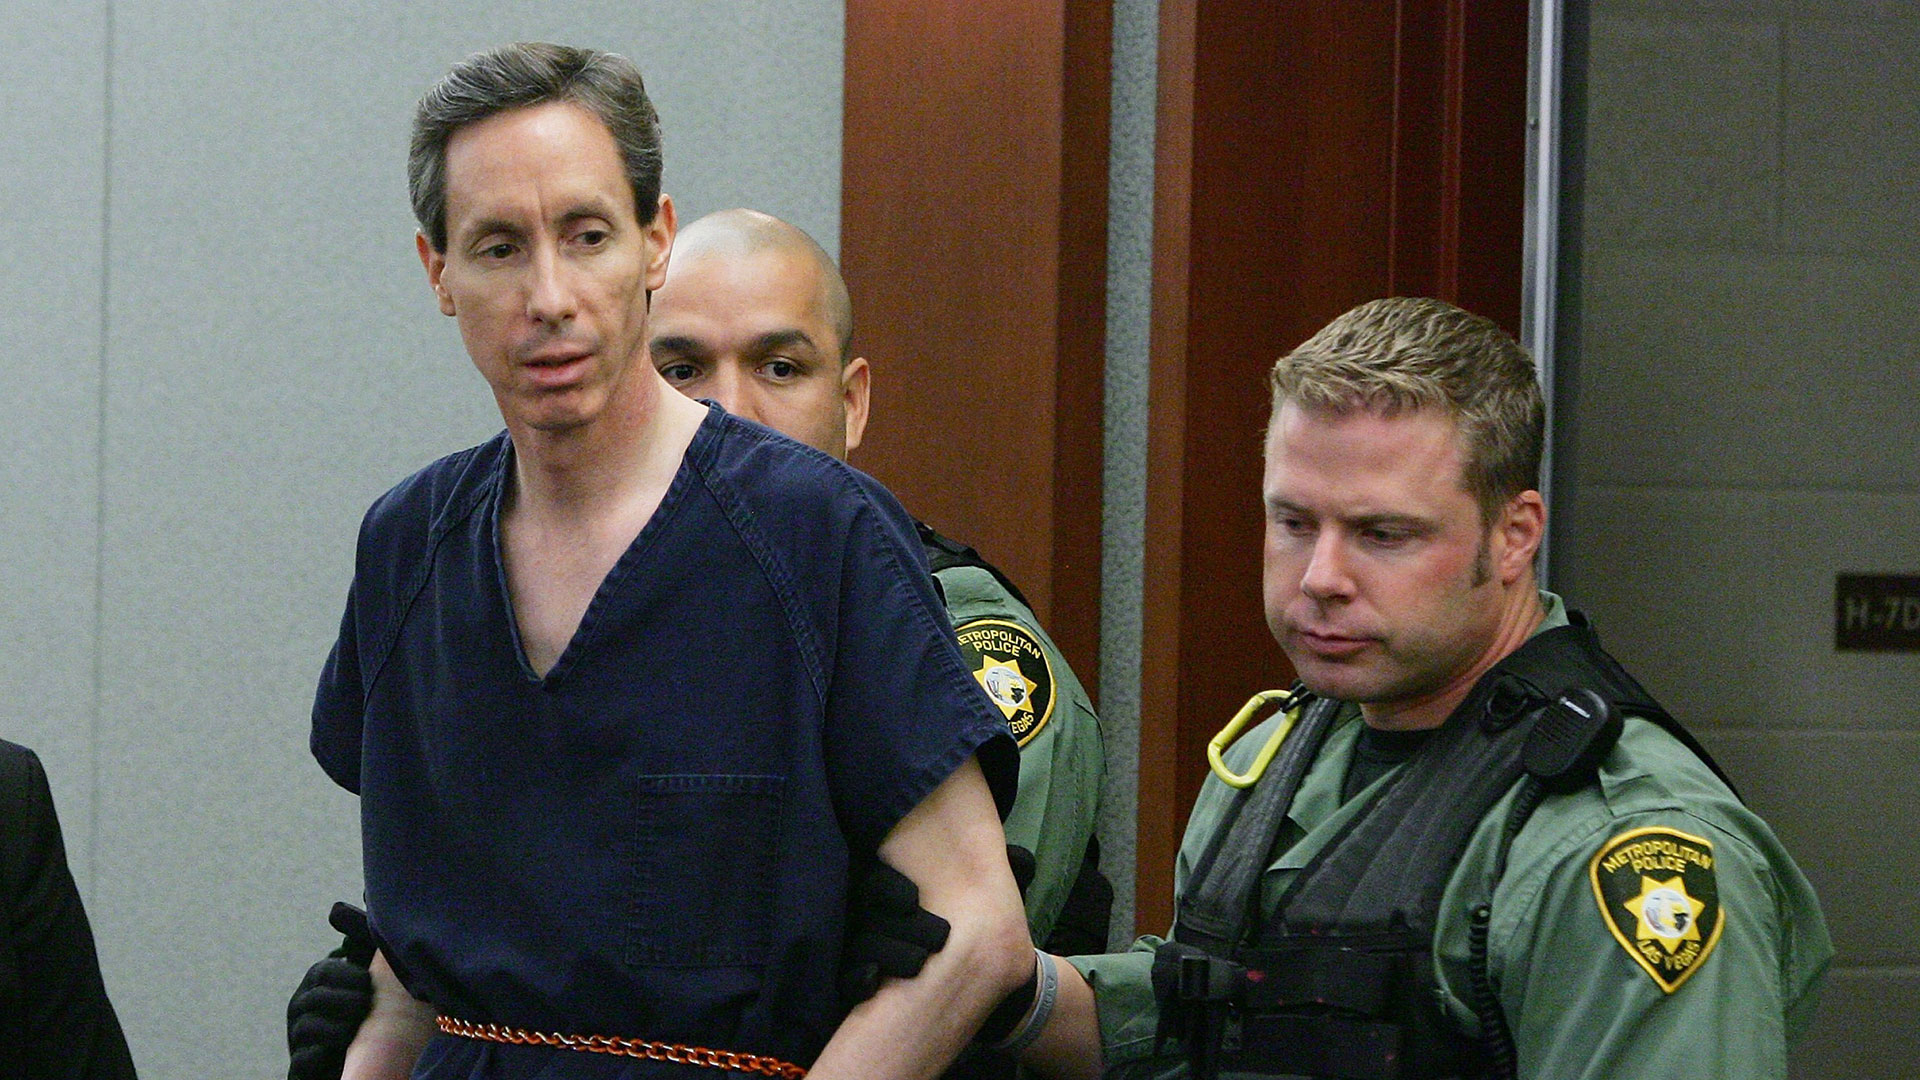 How Polygamist Warren Jeffs Leads the Fundamentalist Mormon Sect from Prison